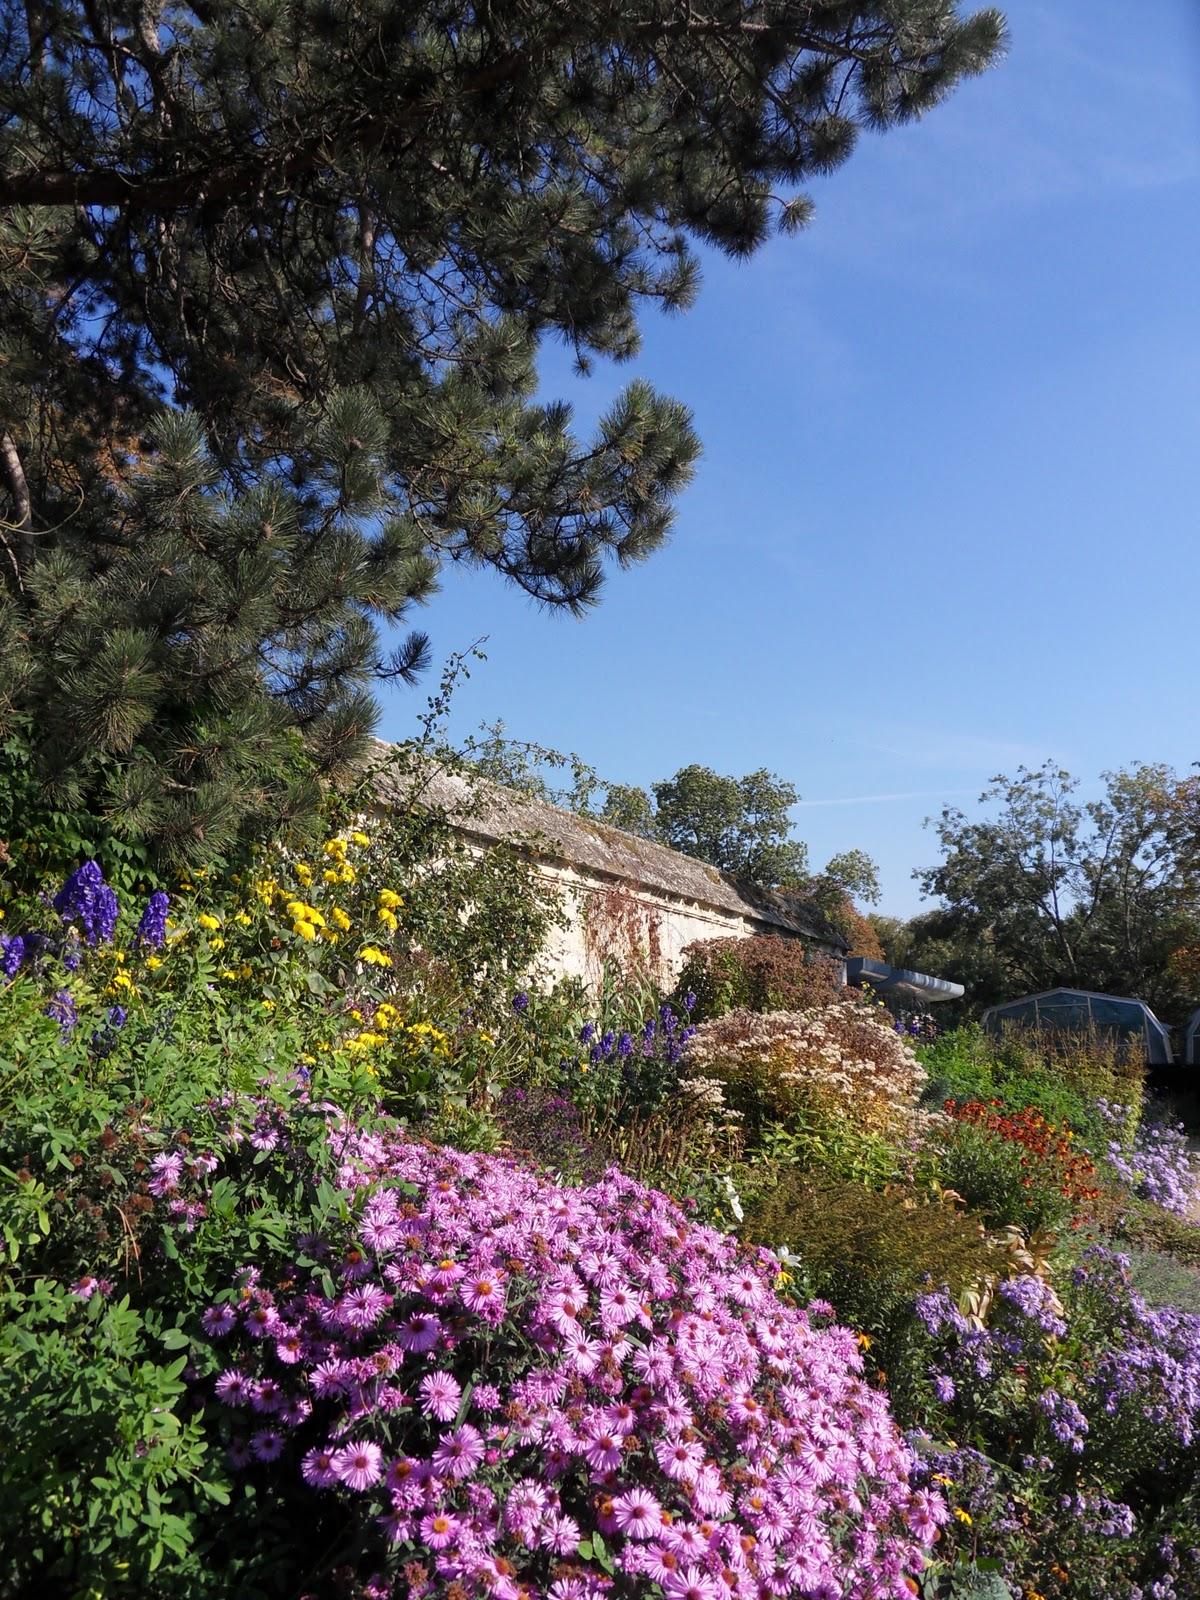 http://3.bp.blogspot.com/-NgcATvIxIzE/Toi4HUZGYHI/AAAAAAAAfqk/zpxY0K180ag/s1600/Botanic+Garden.JPG